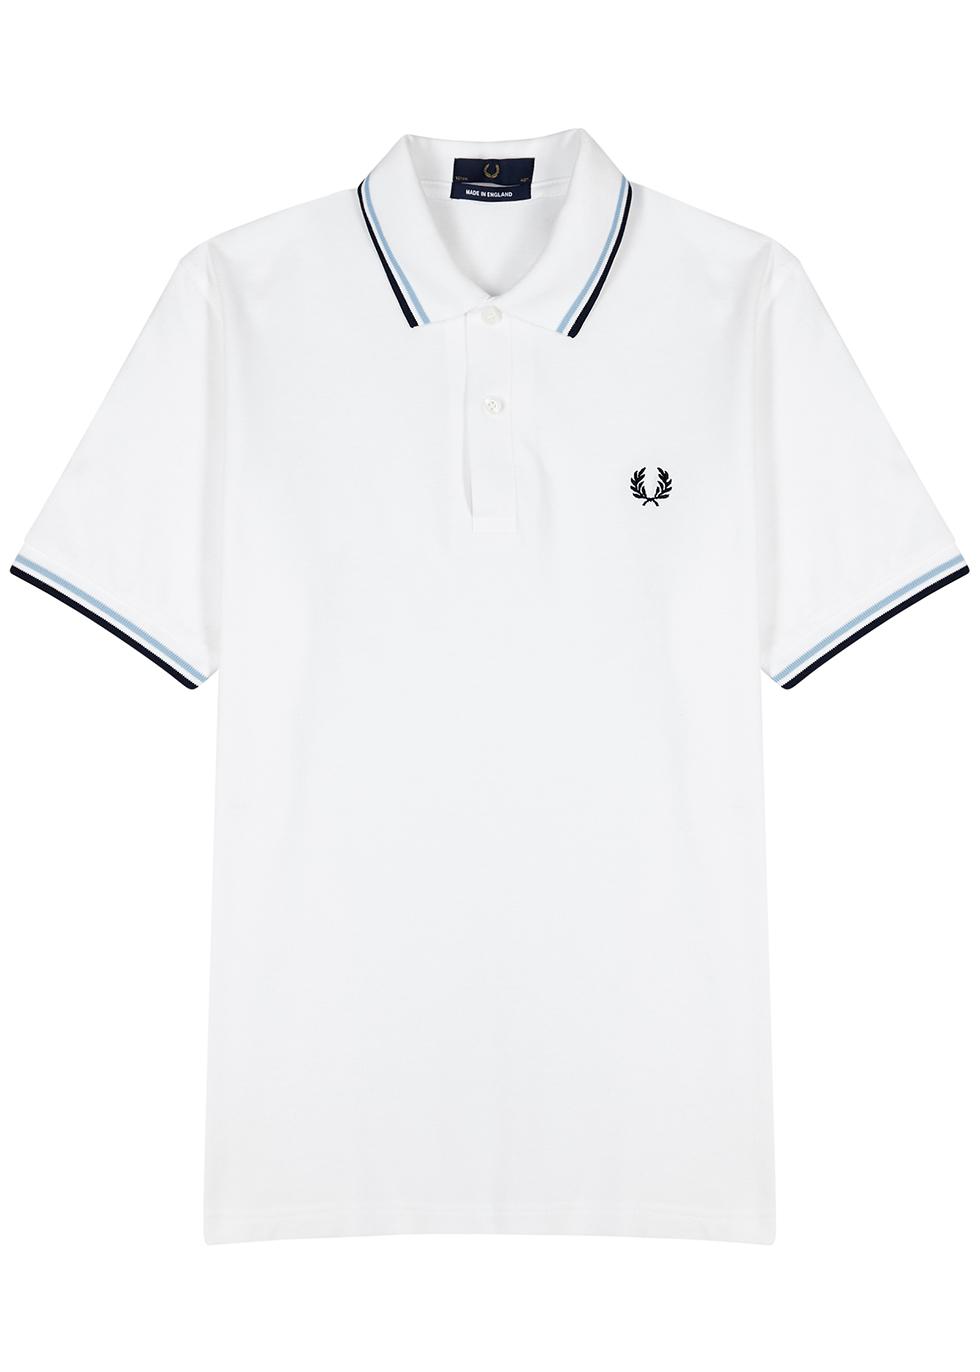 M3600 white piqué cotton polo shirt